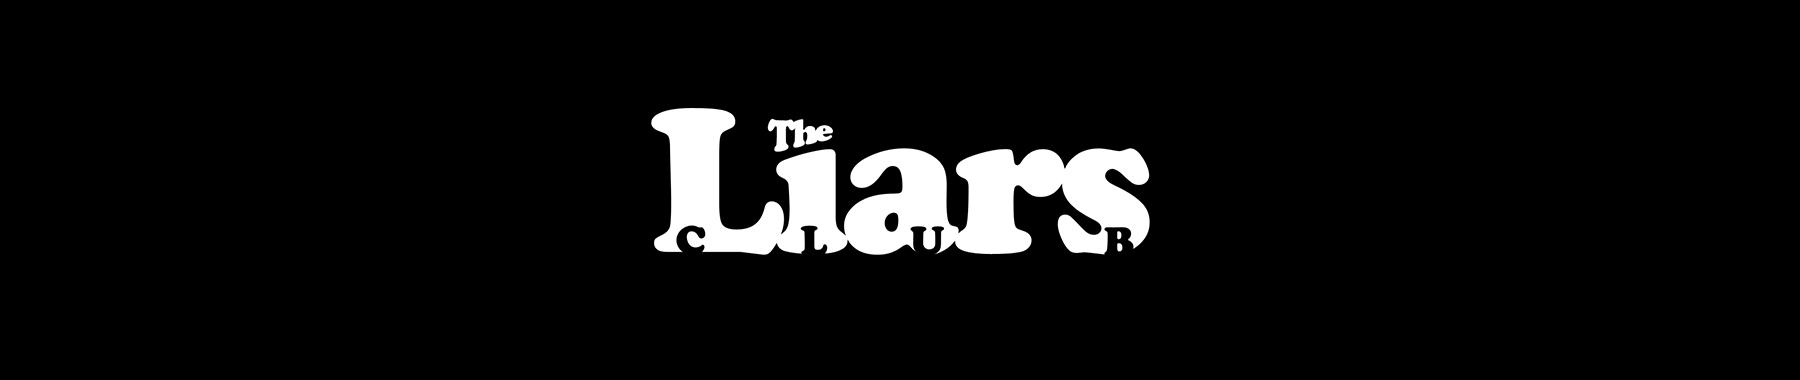 liars club.jpg